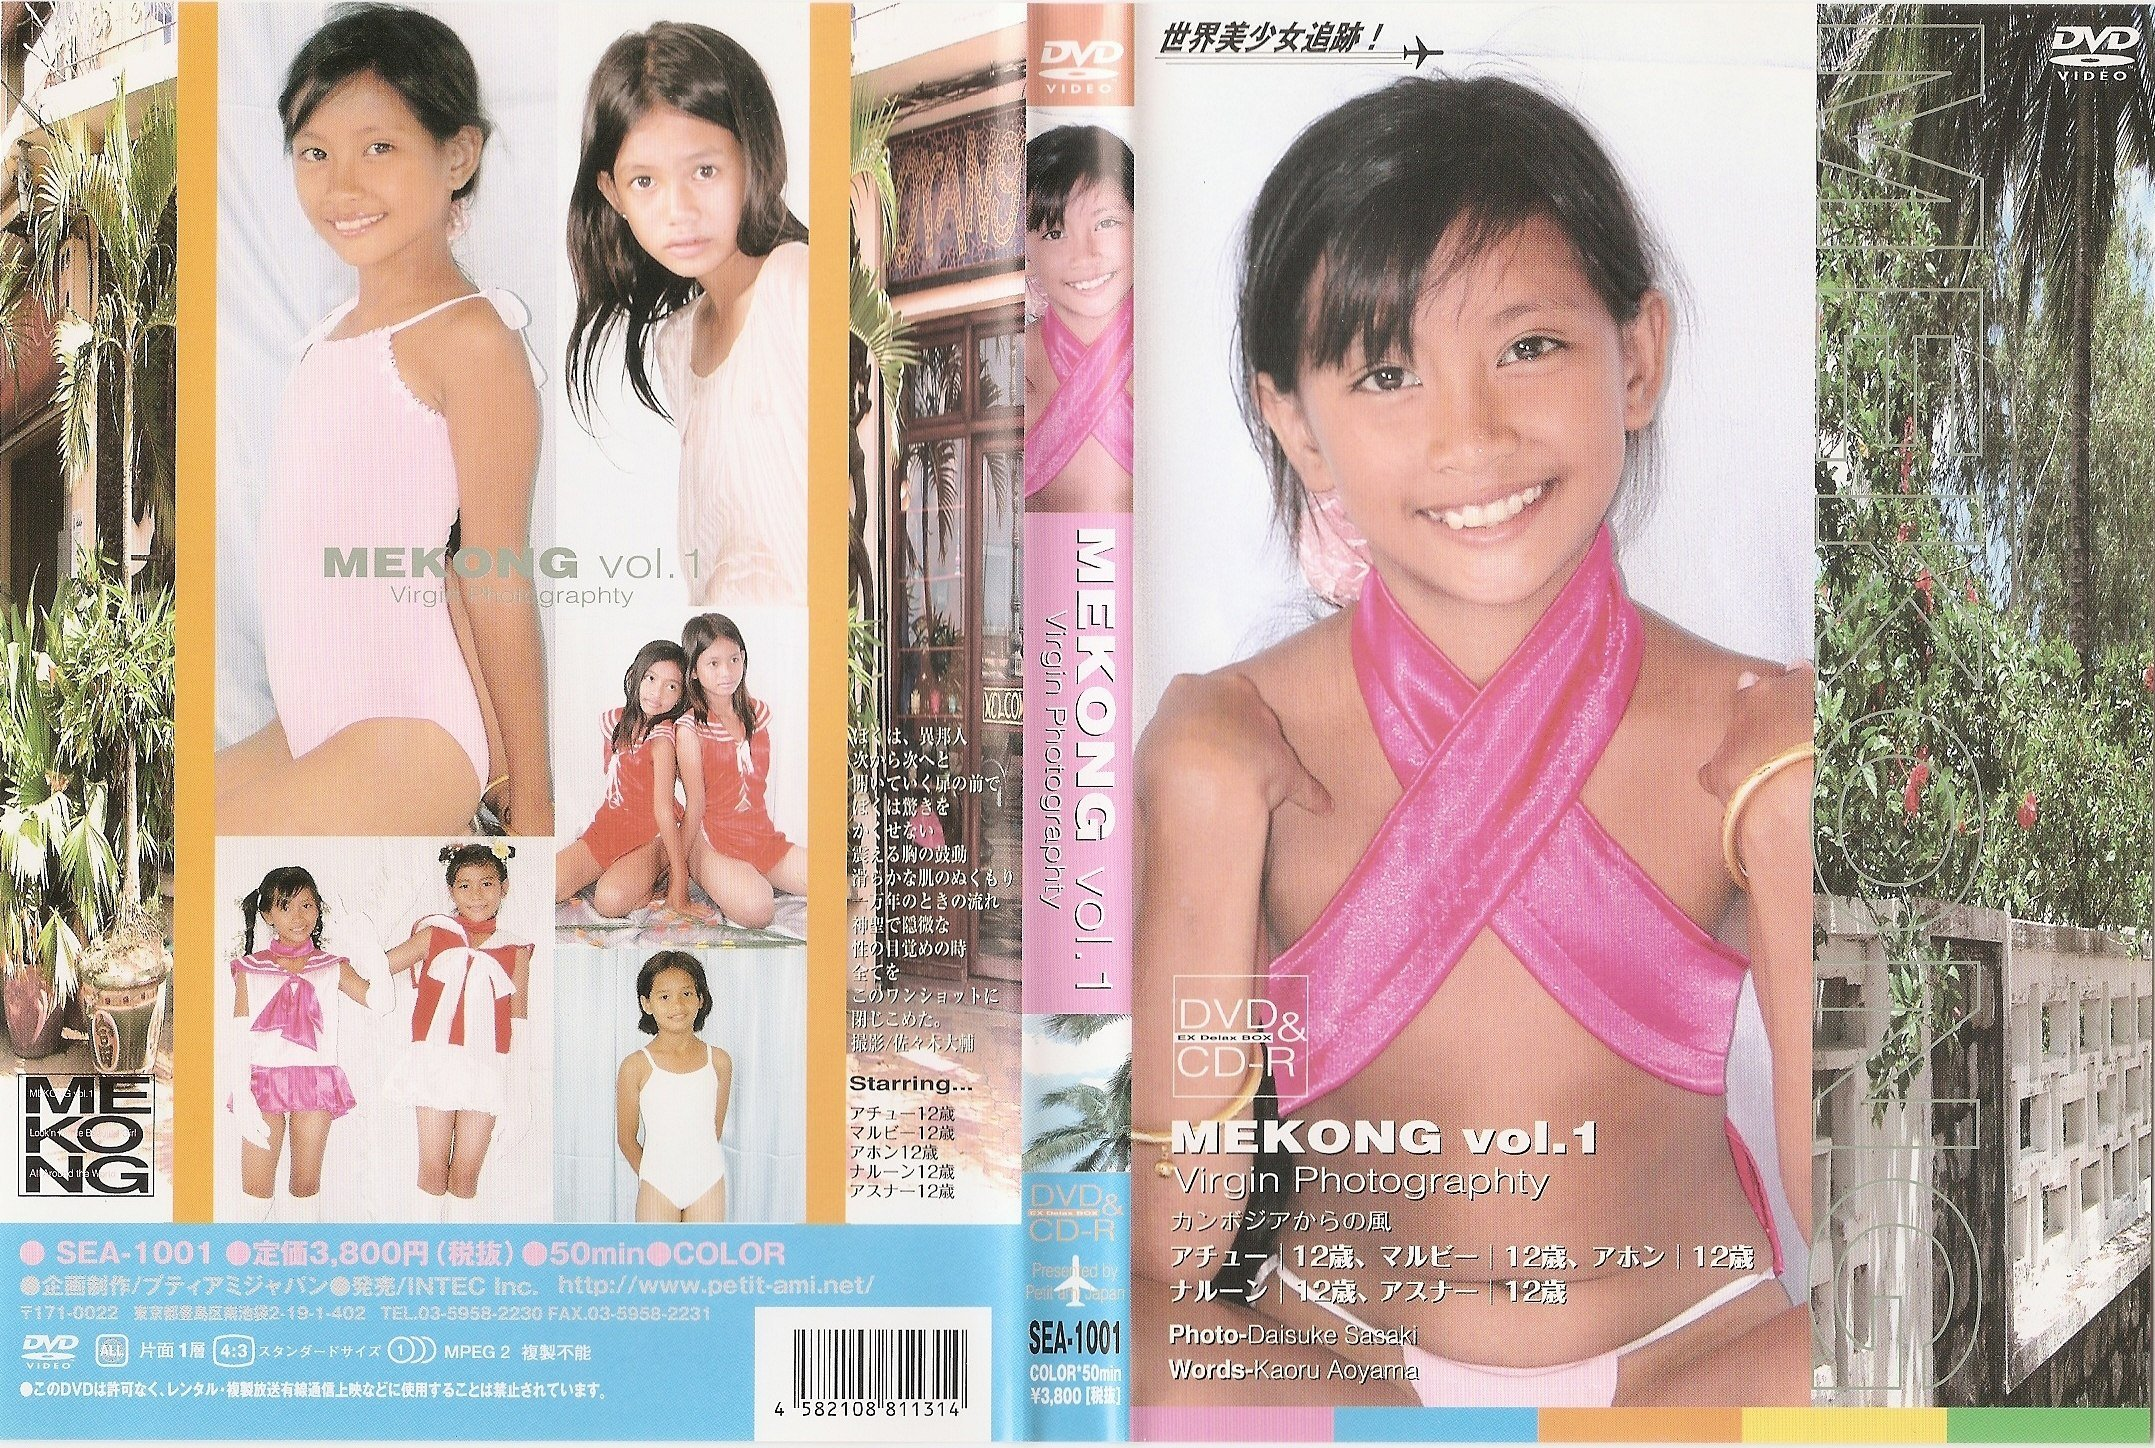 Mekong Vol 1